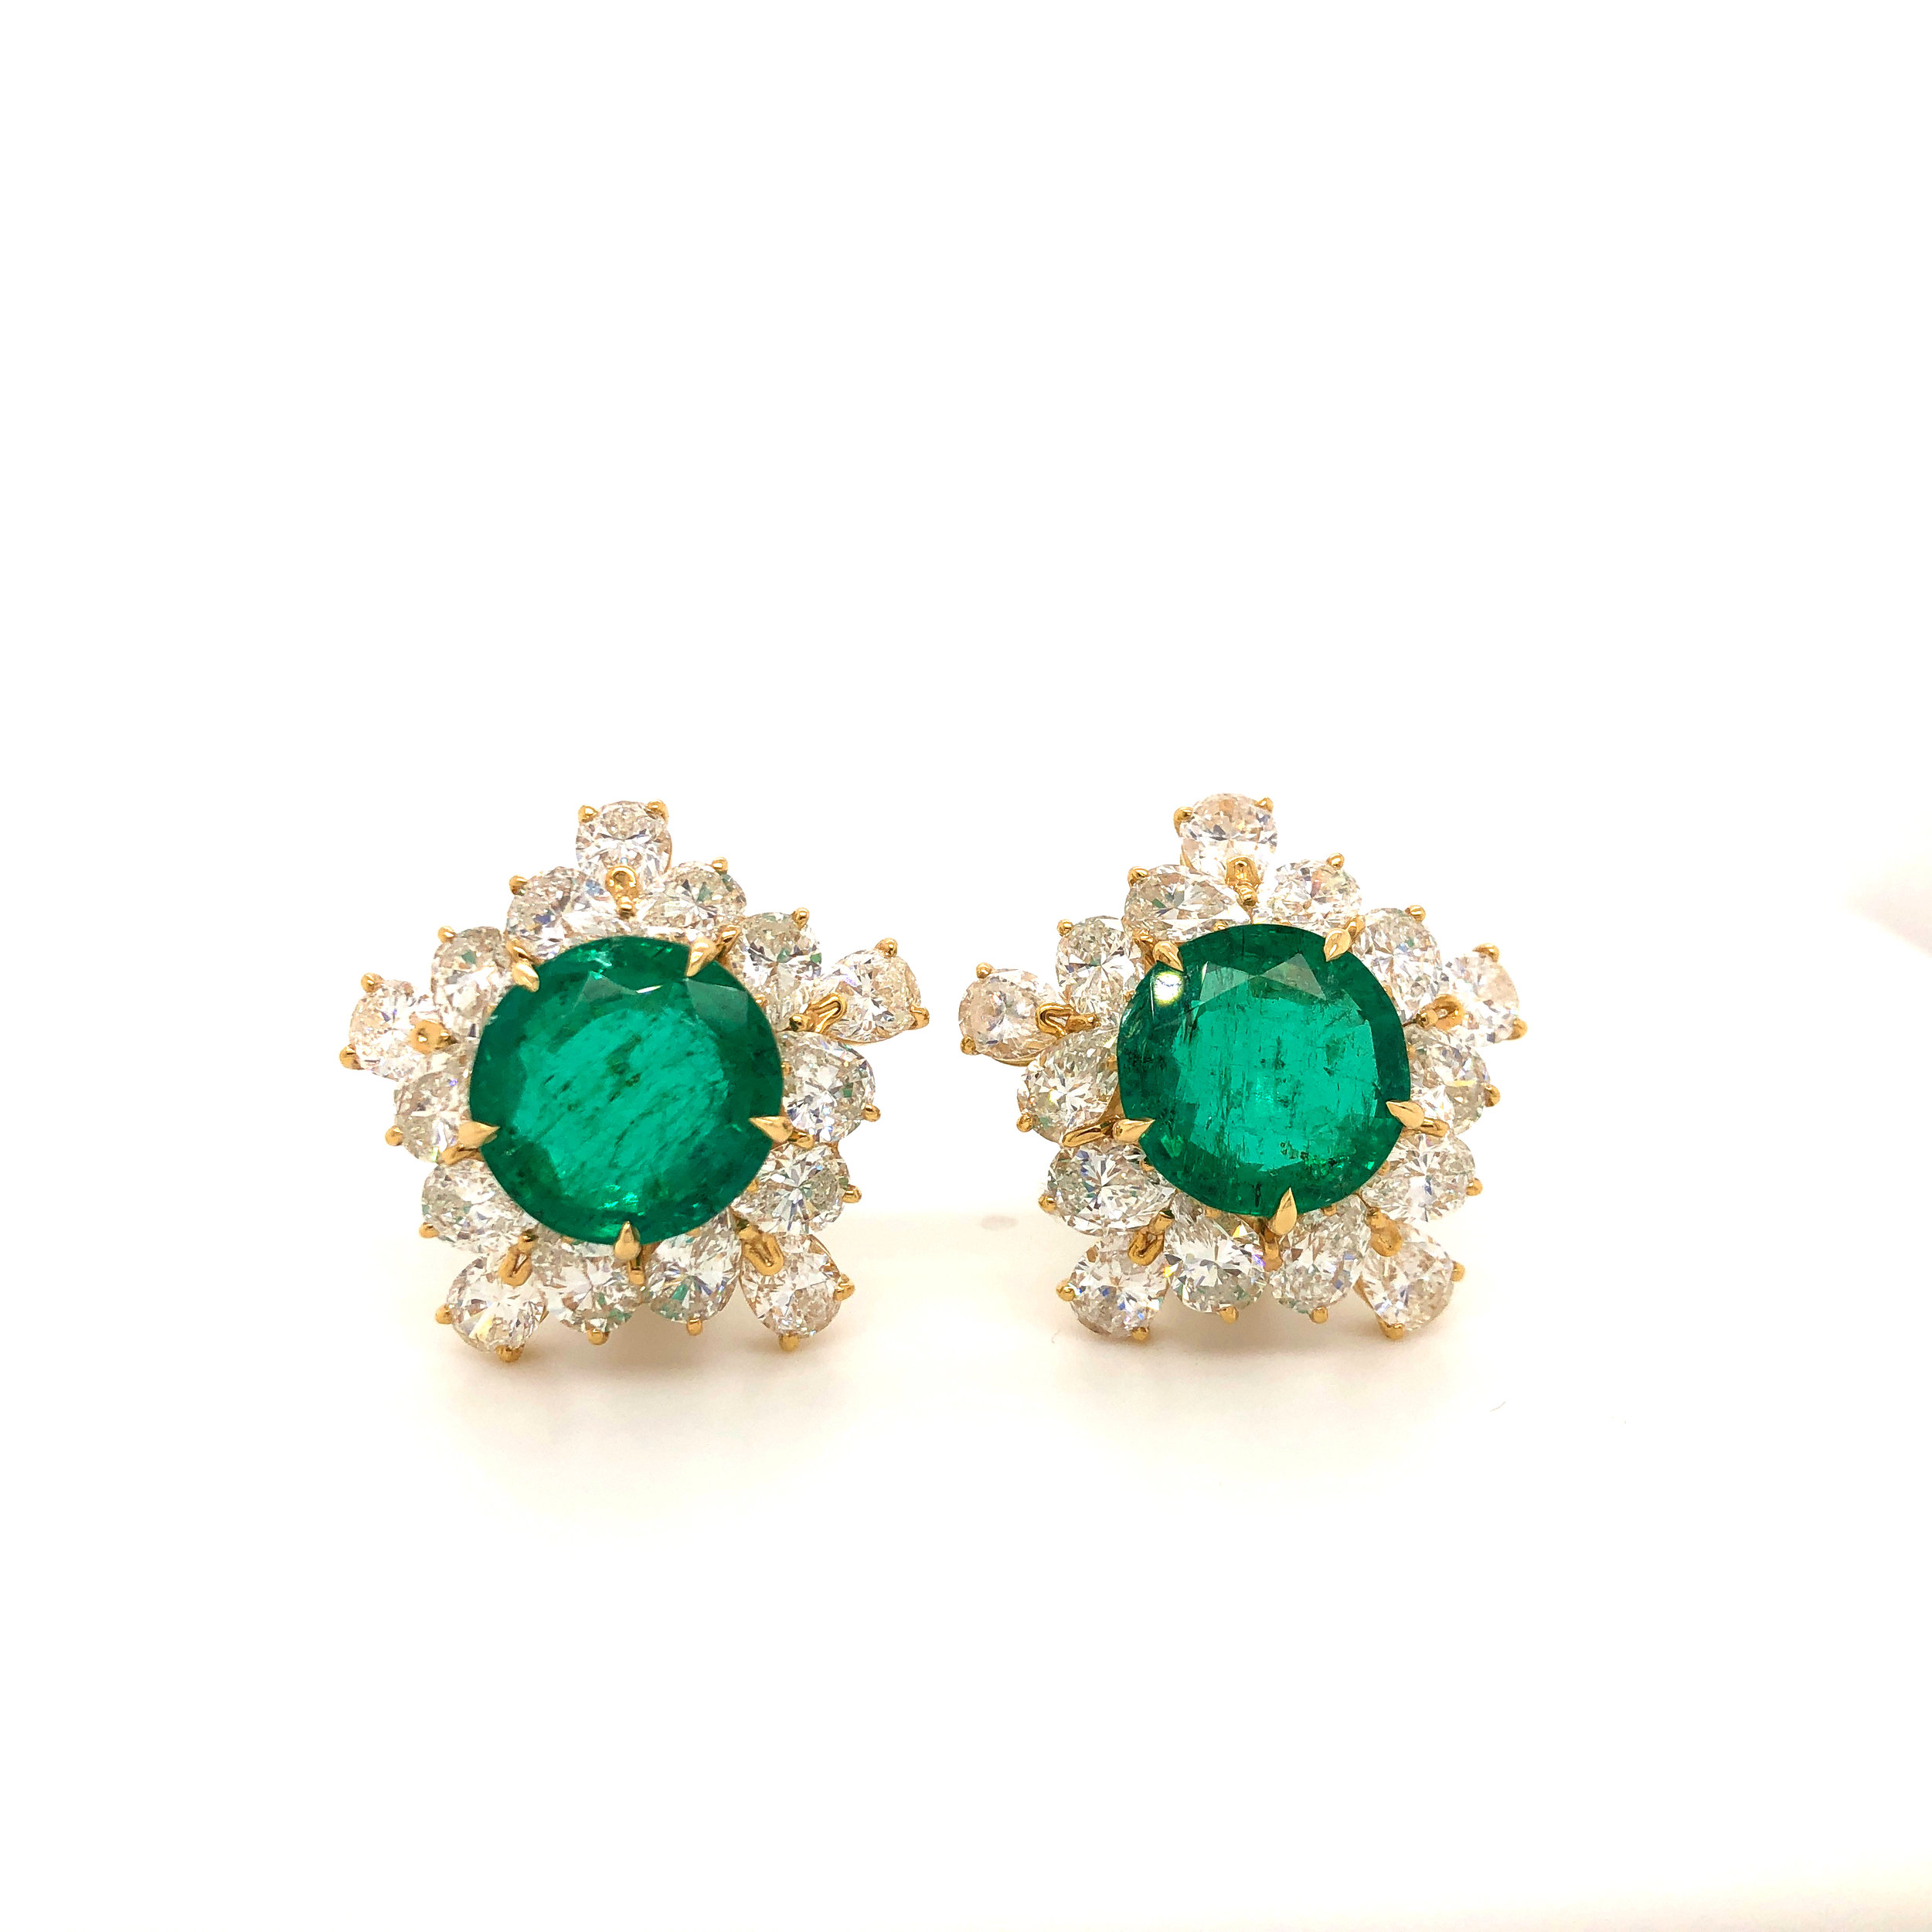 Important Emerald & Diamond Earrings, 18kt Yellow Gold & Platinum,  Bulgari   Est. US$ 95,000-110,000